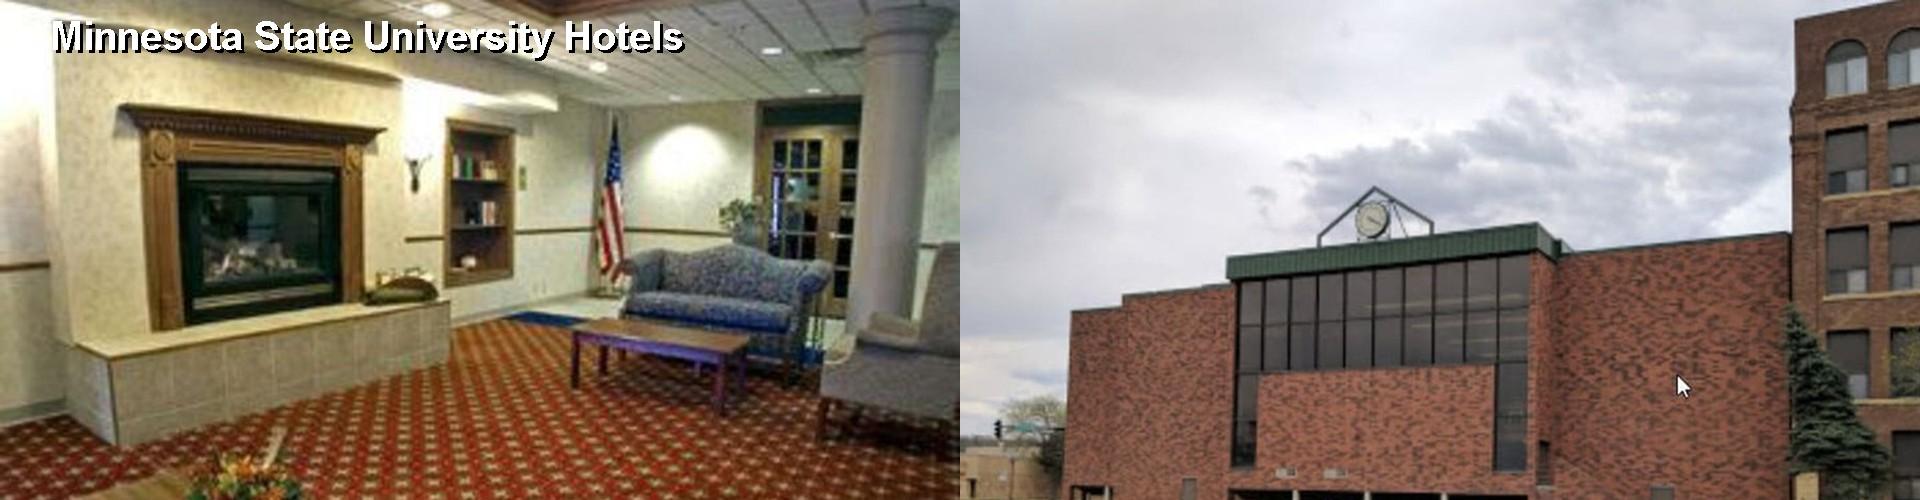 5 Best Hotels Near Minnesota State University